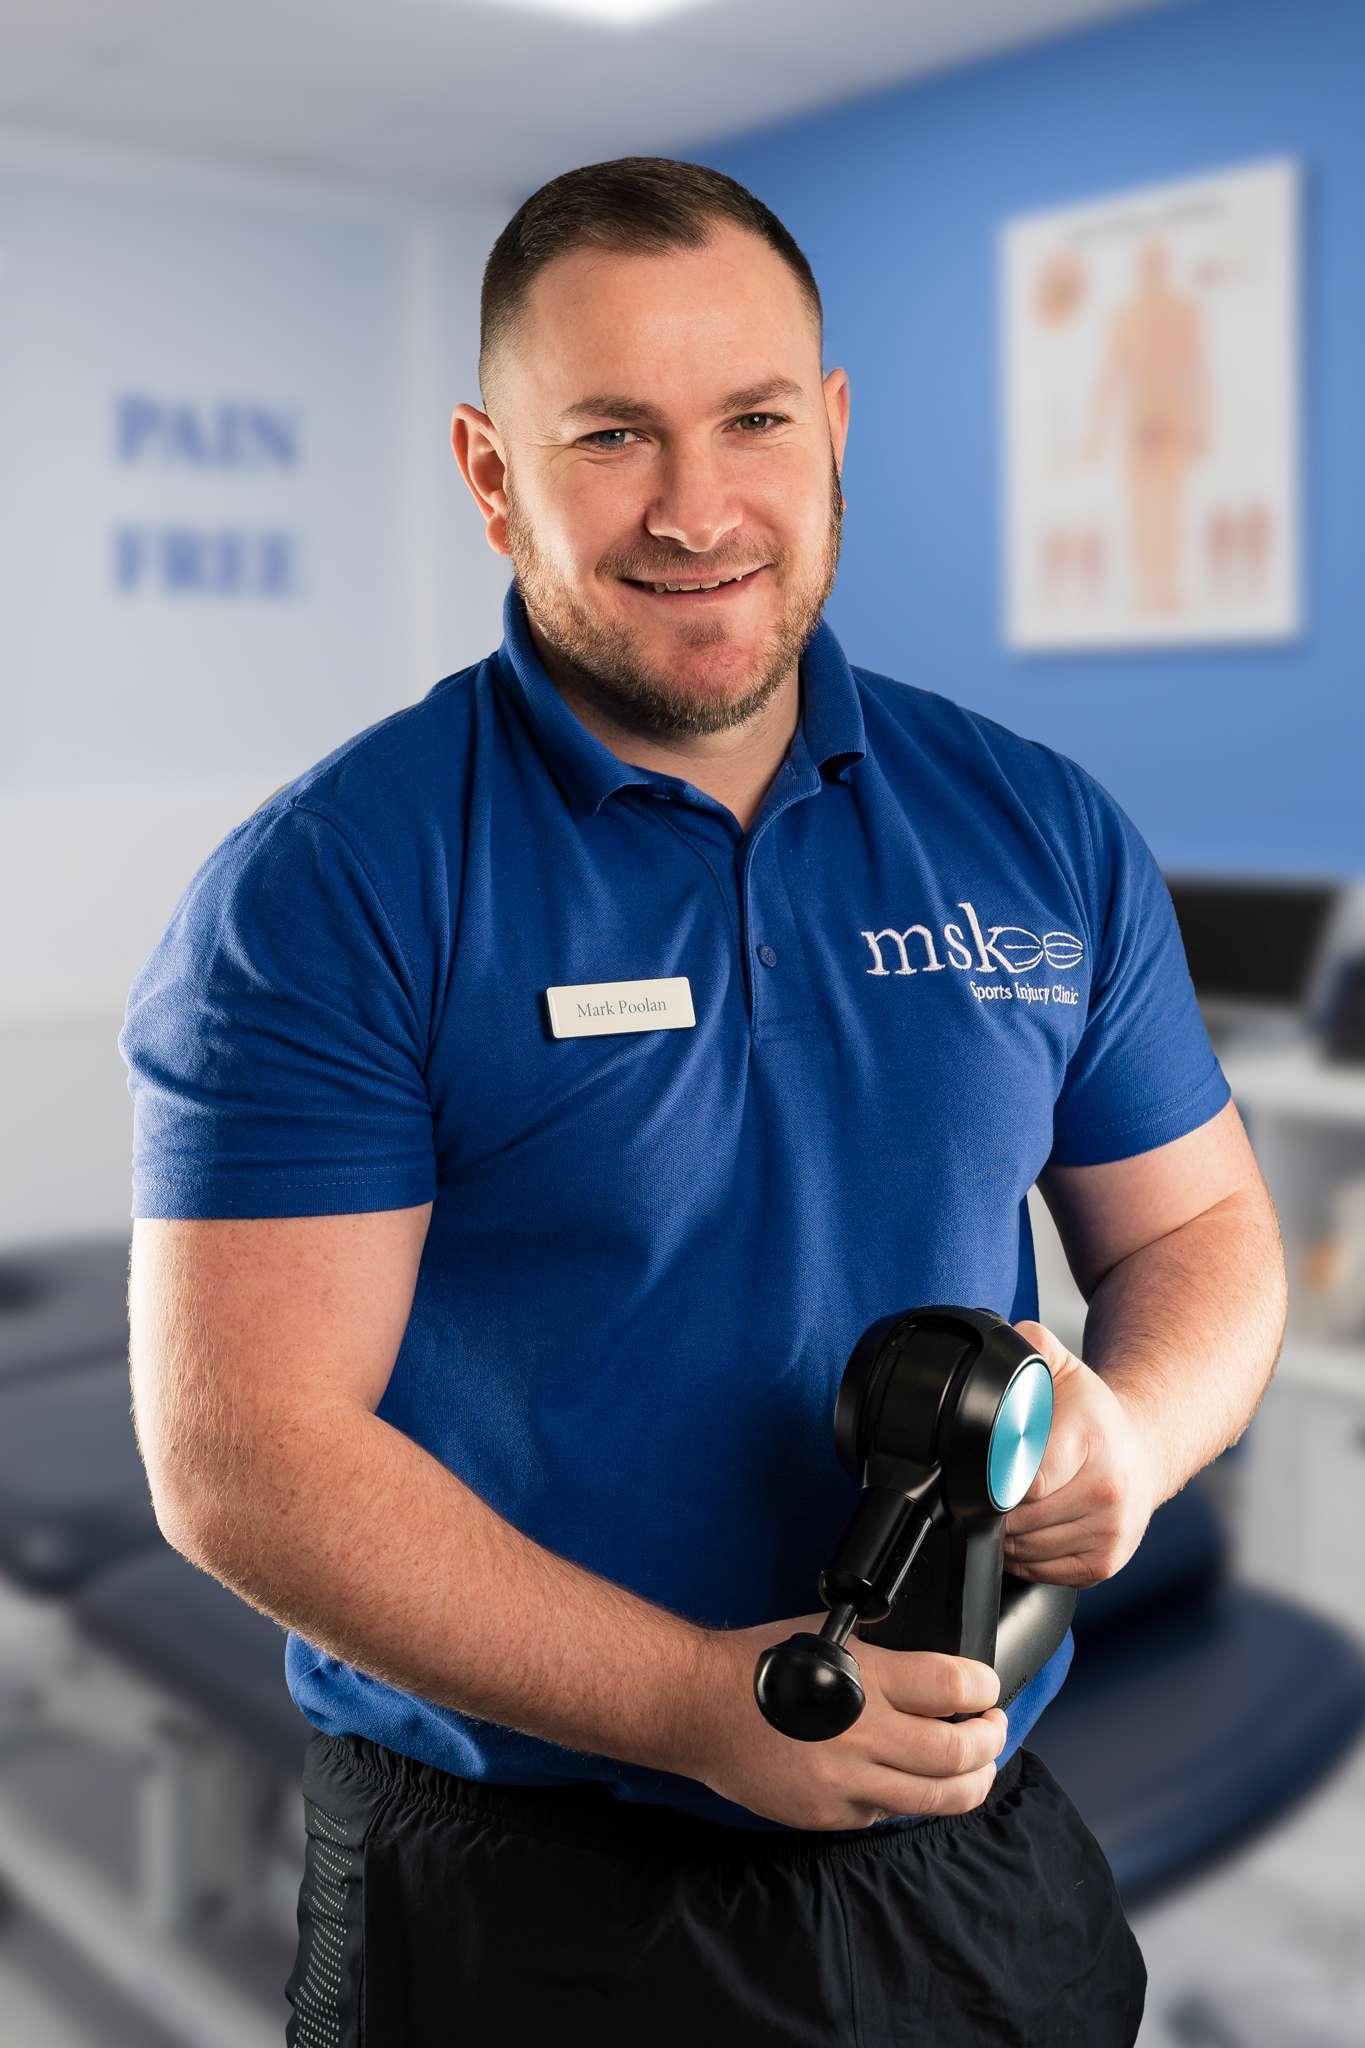 MSK Sports Injury Clinic